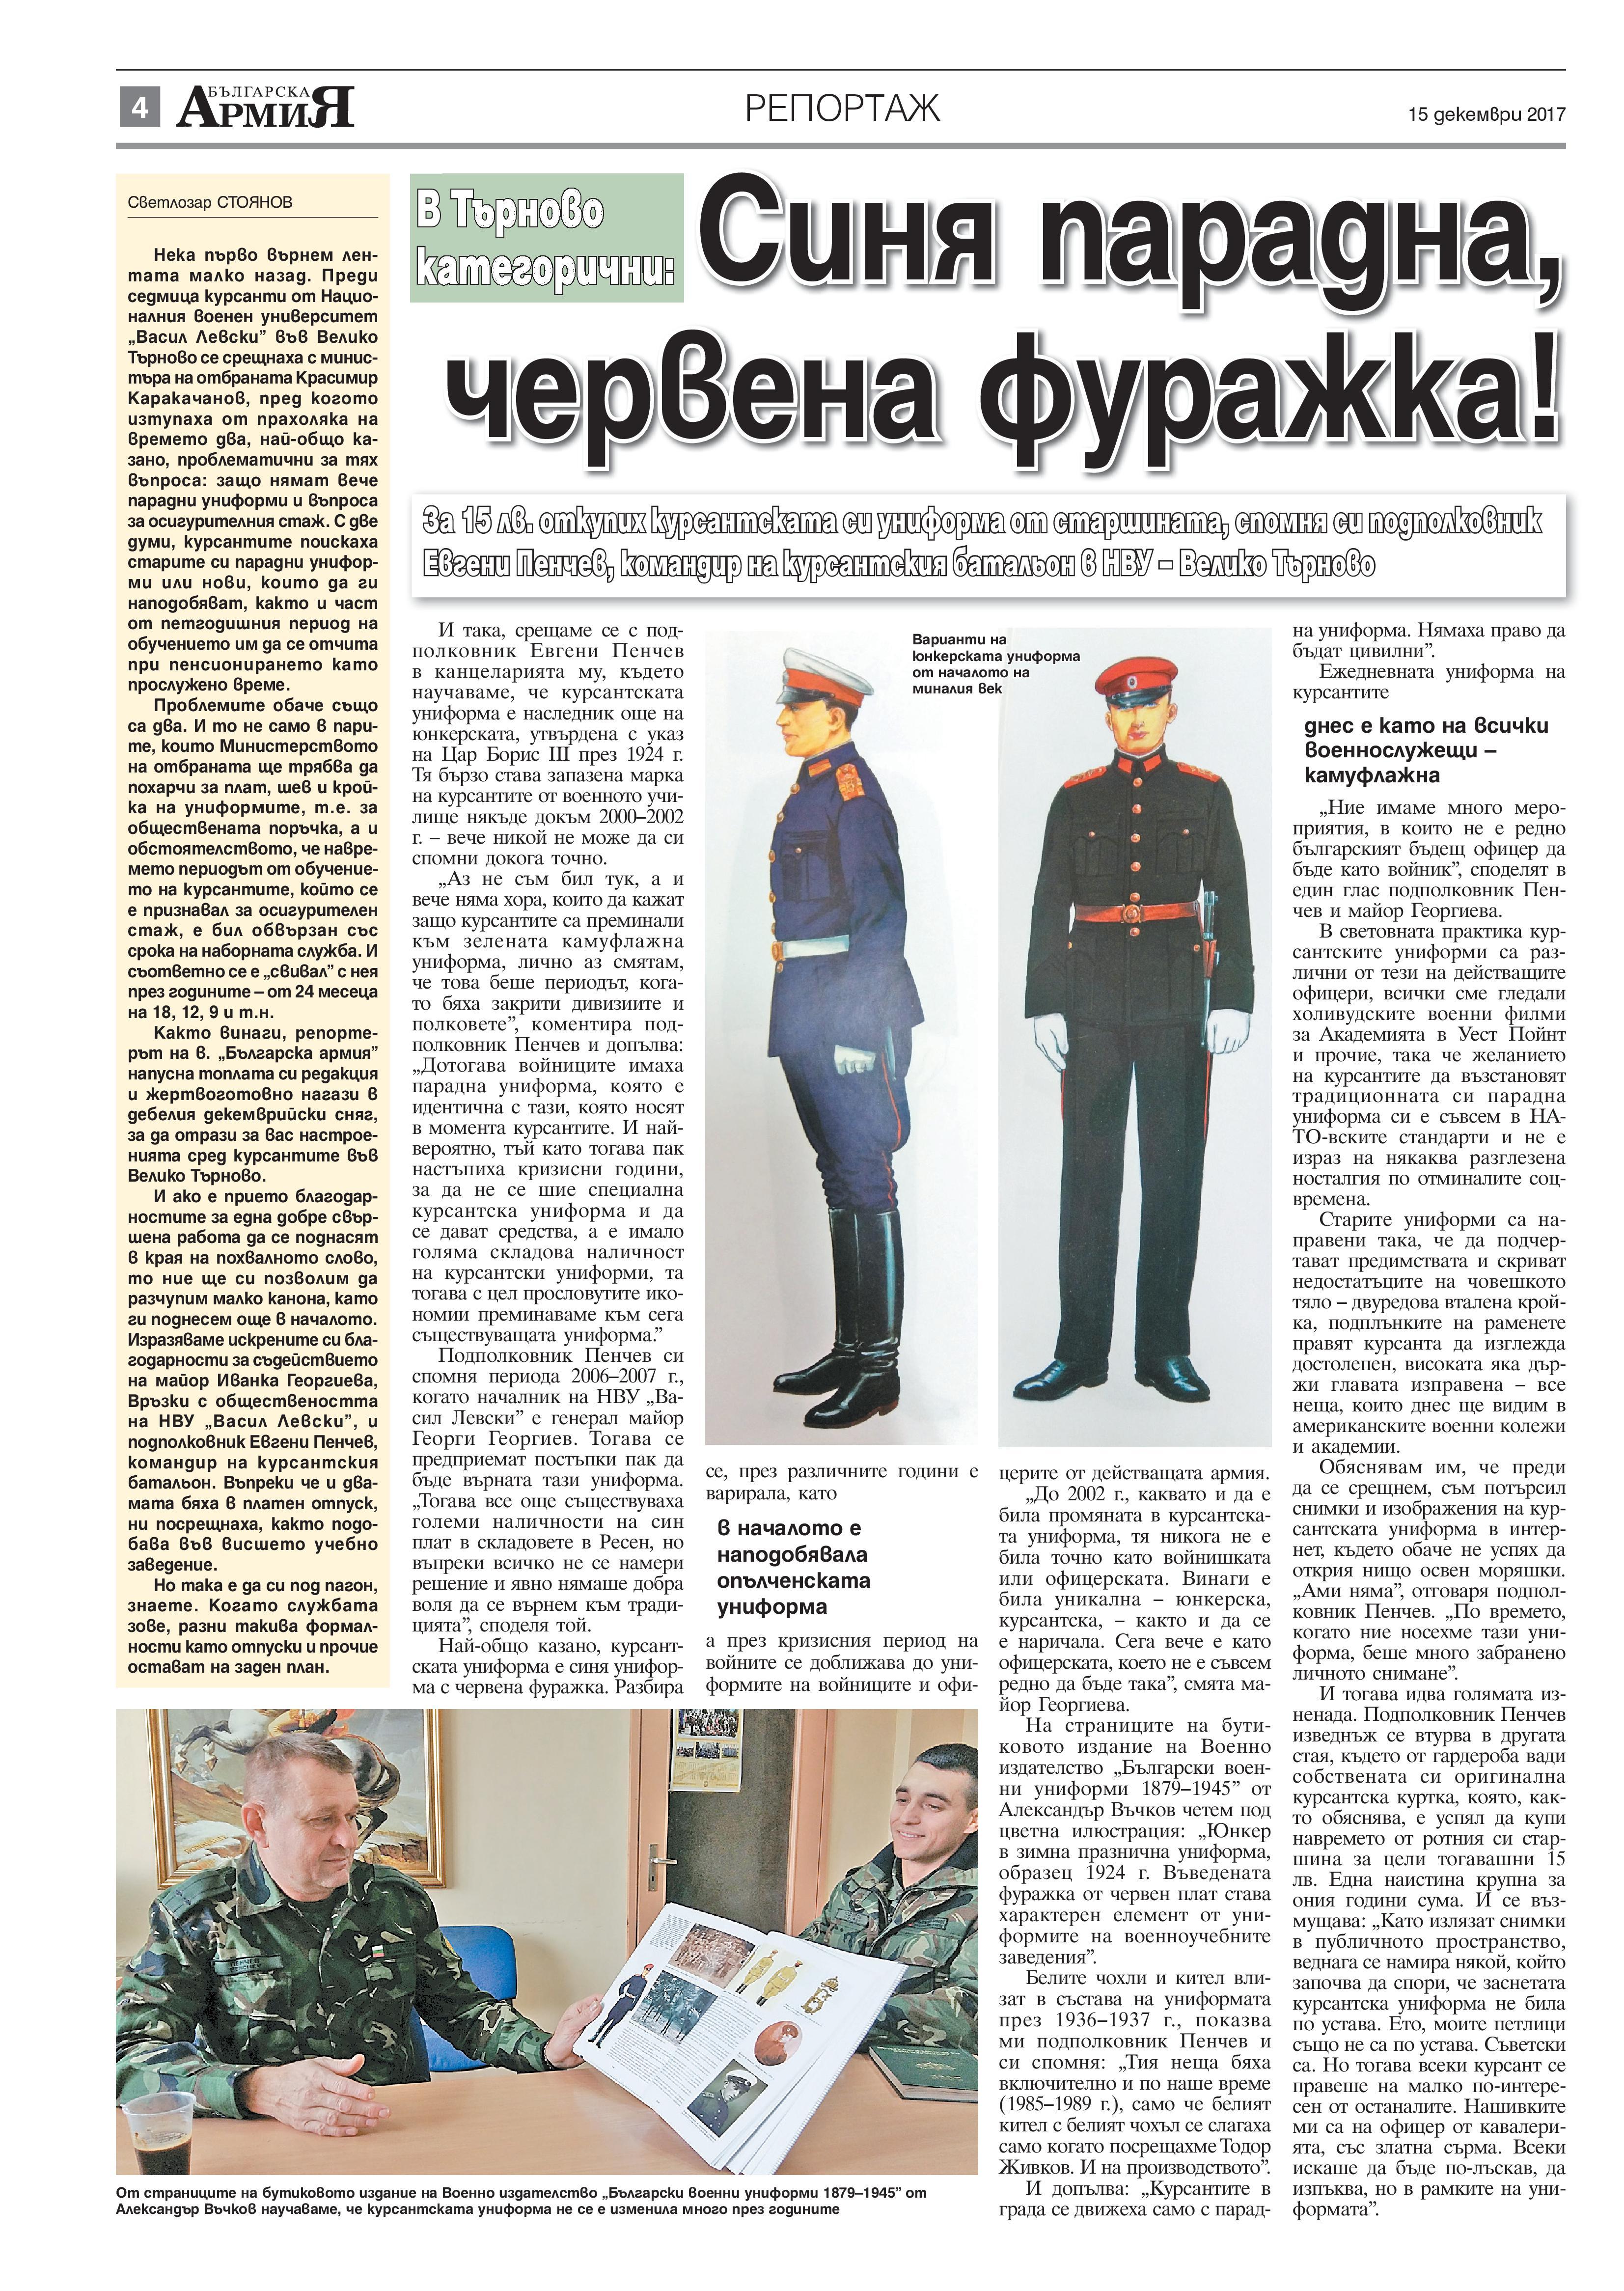 https://armymedia.bg/wp-content/uploads/2015/06/04-14.jpg